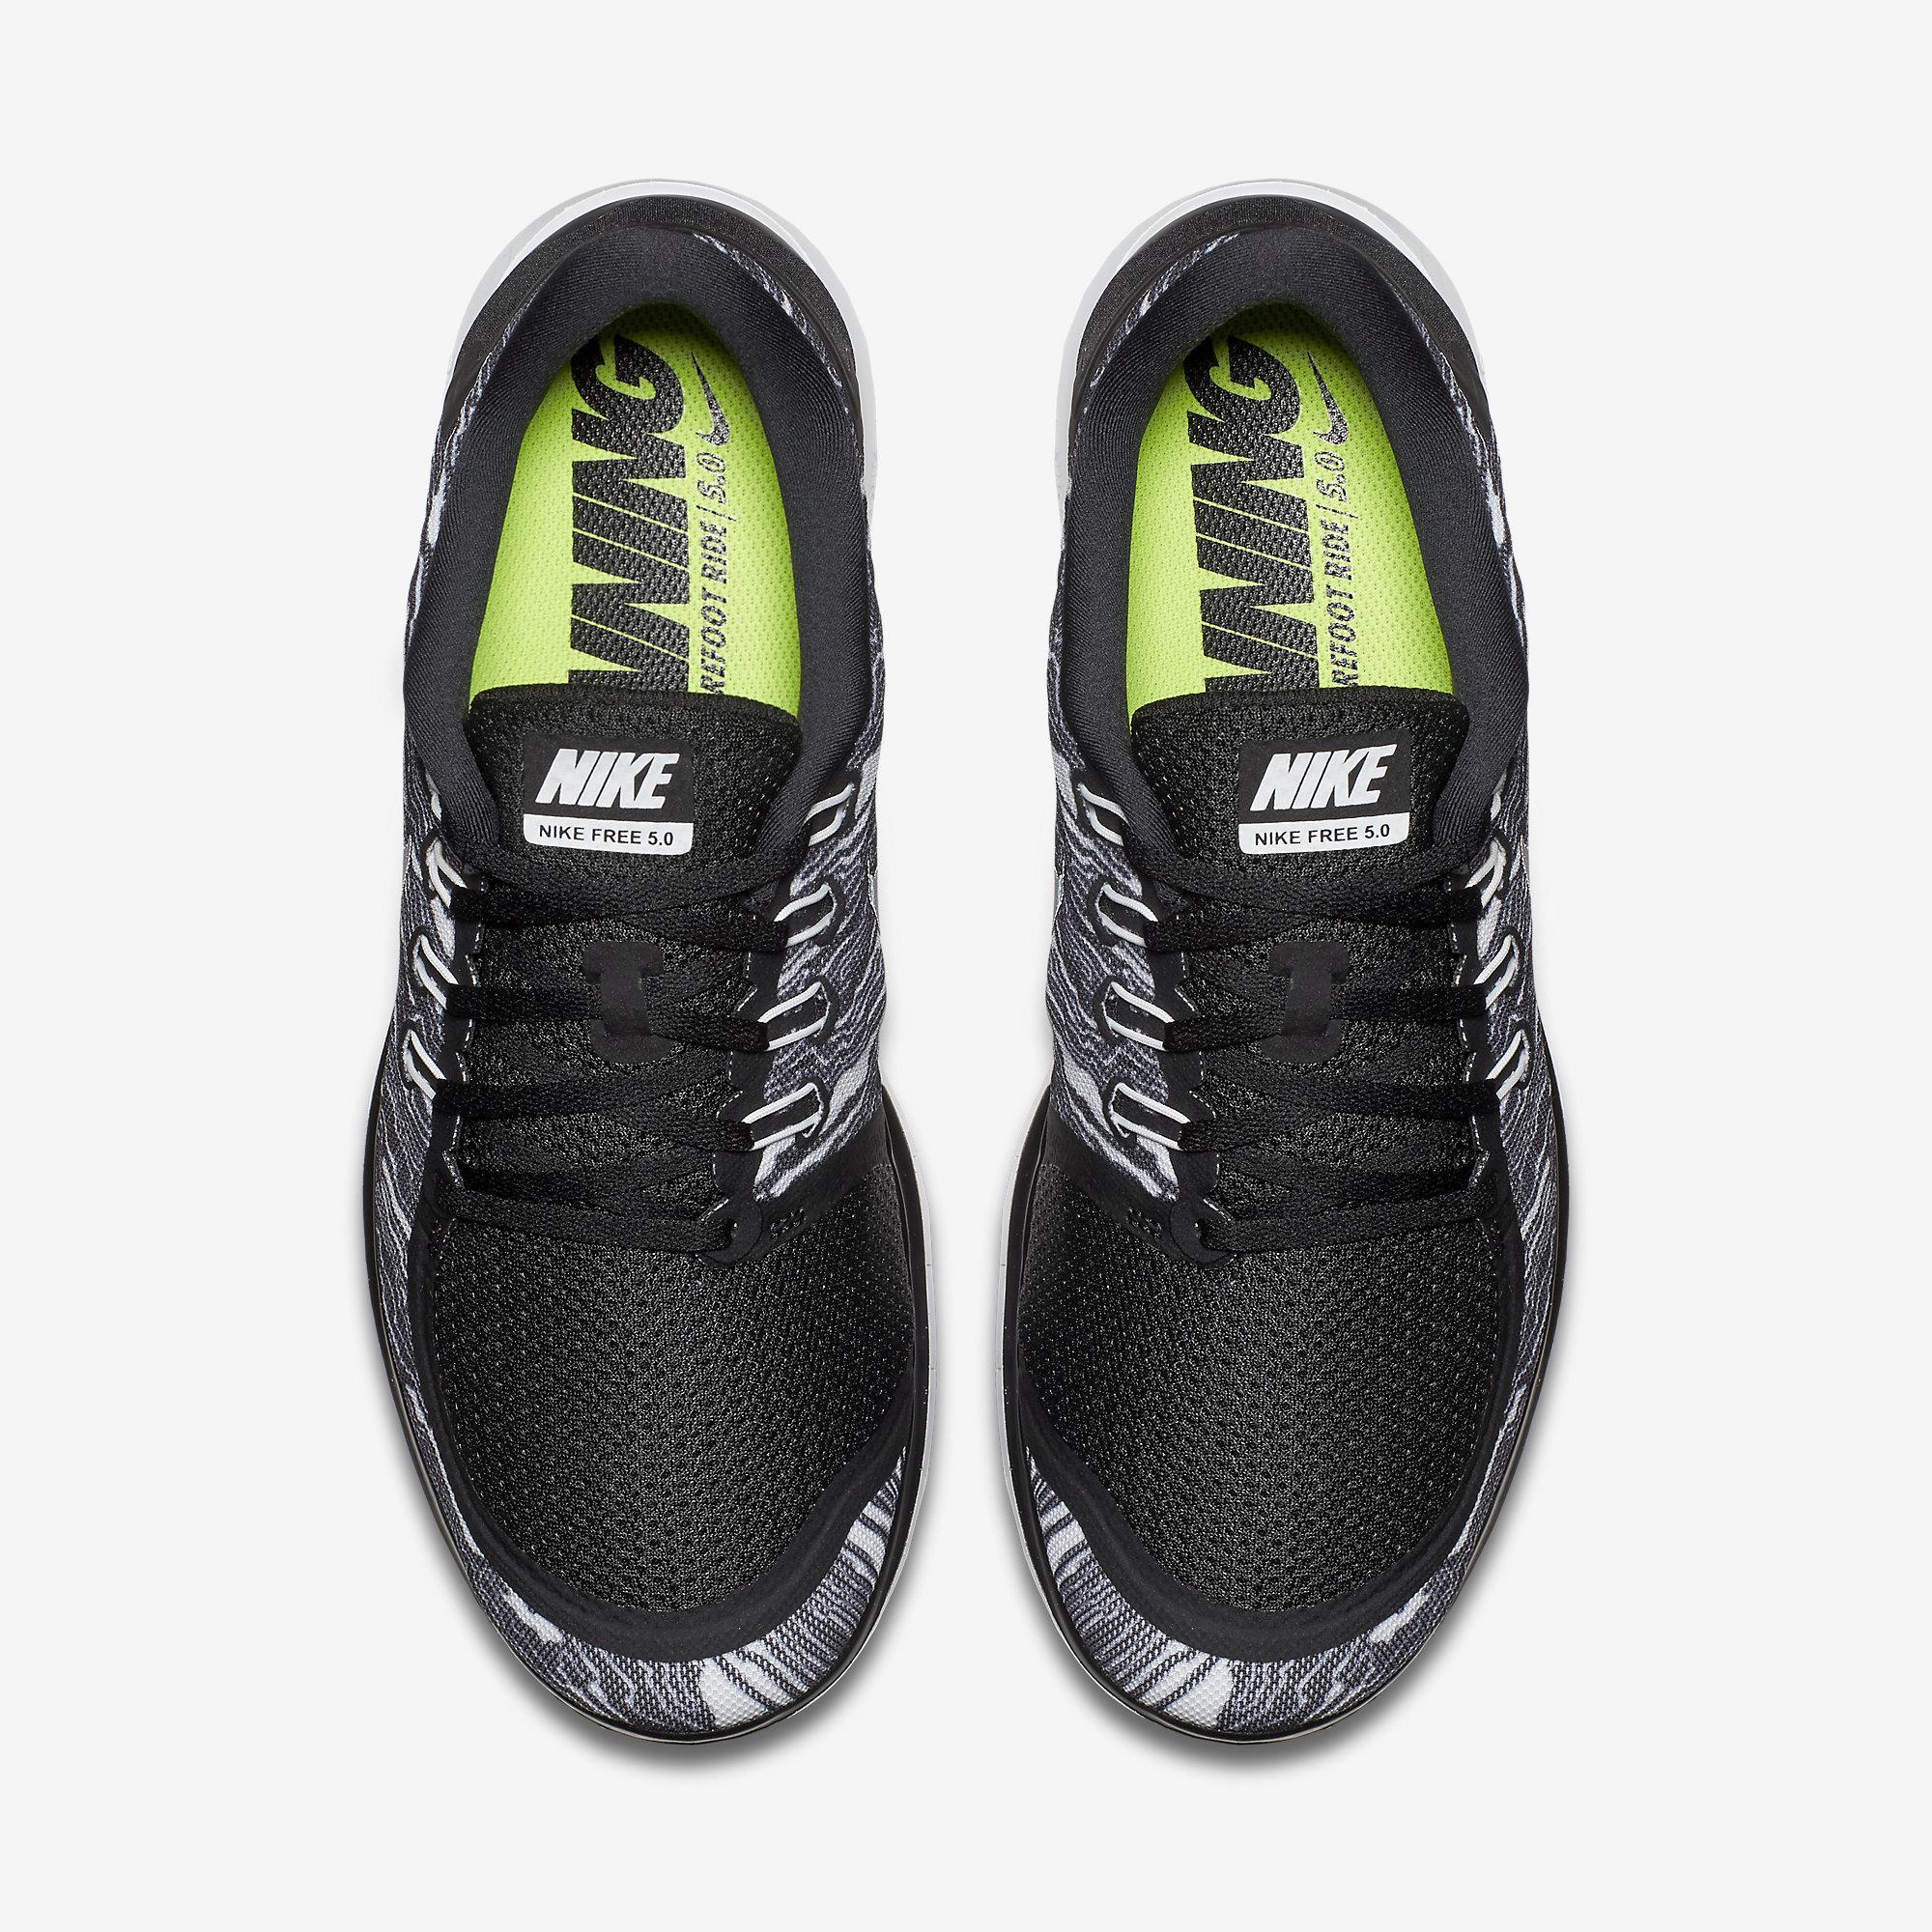 huge discount 57a7d 3e8c6 Nike Mens Free 5.0 Print Running Shoes - Black White